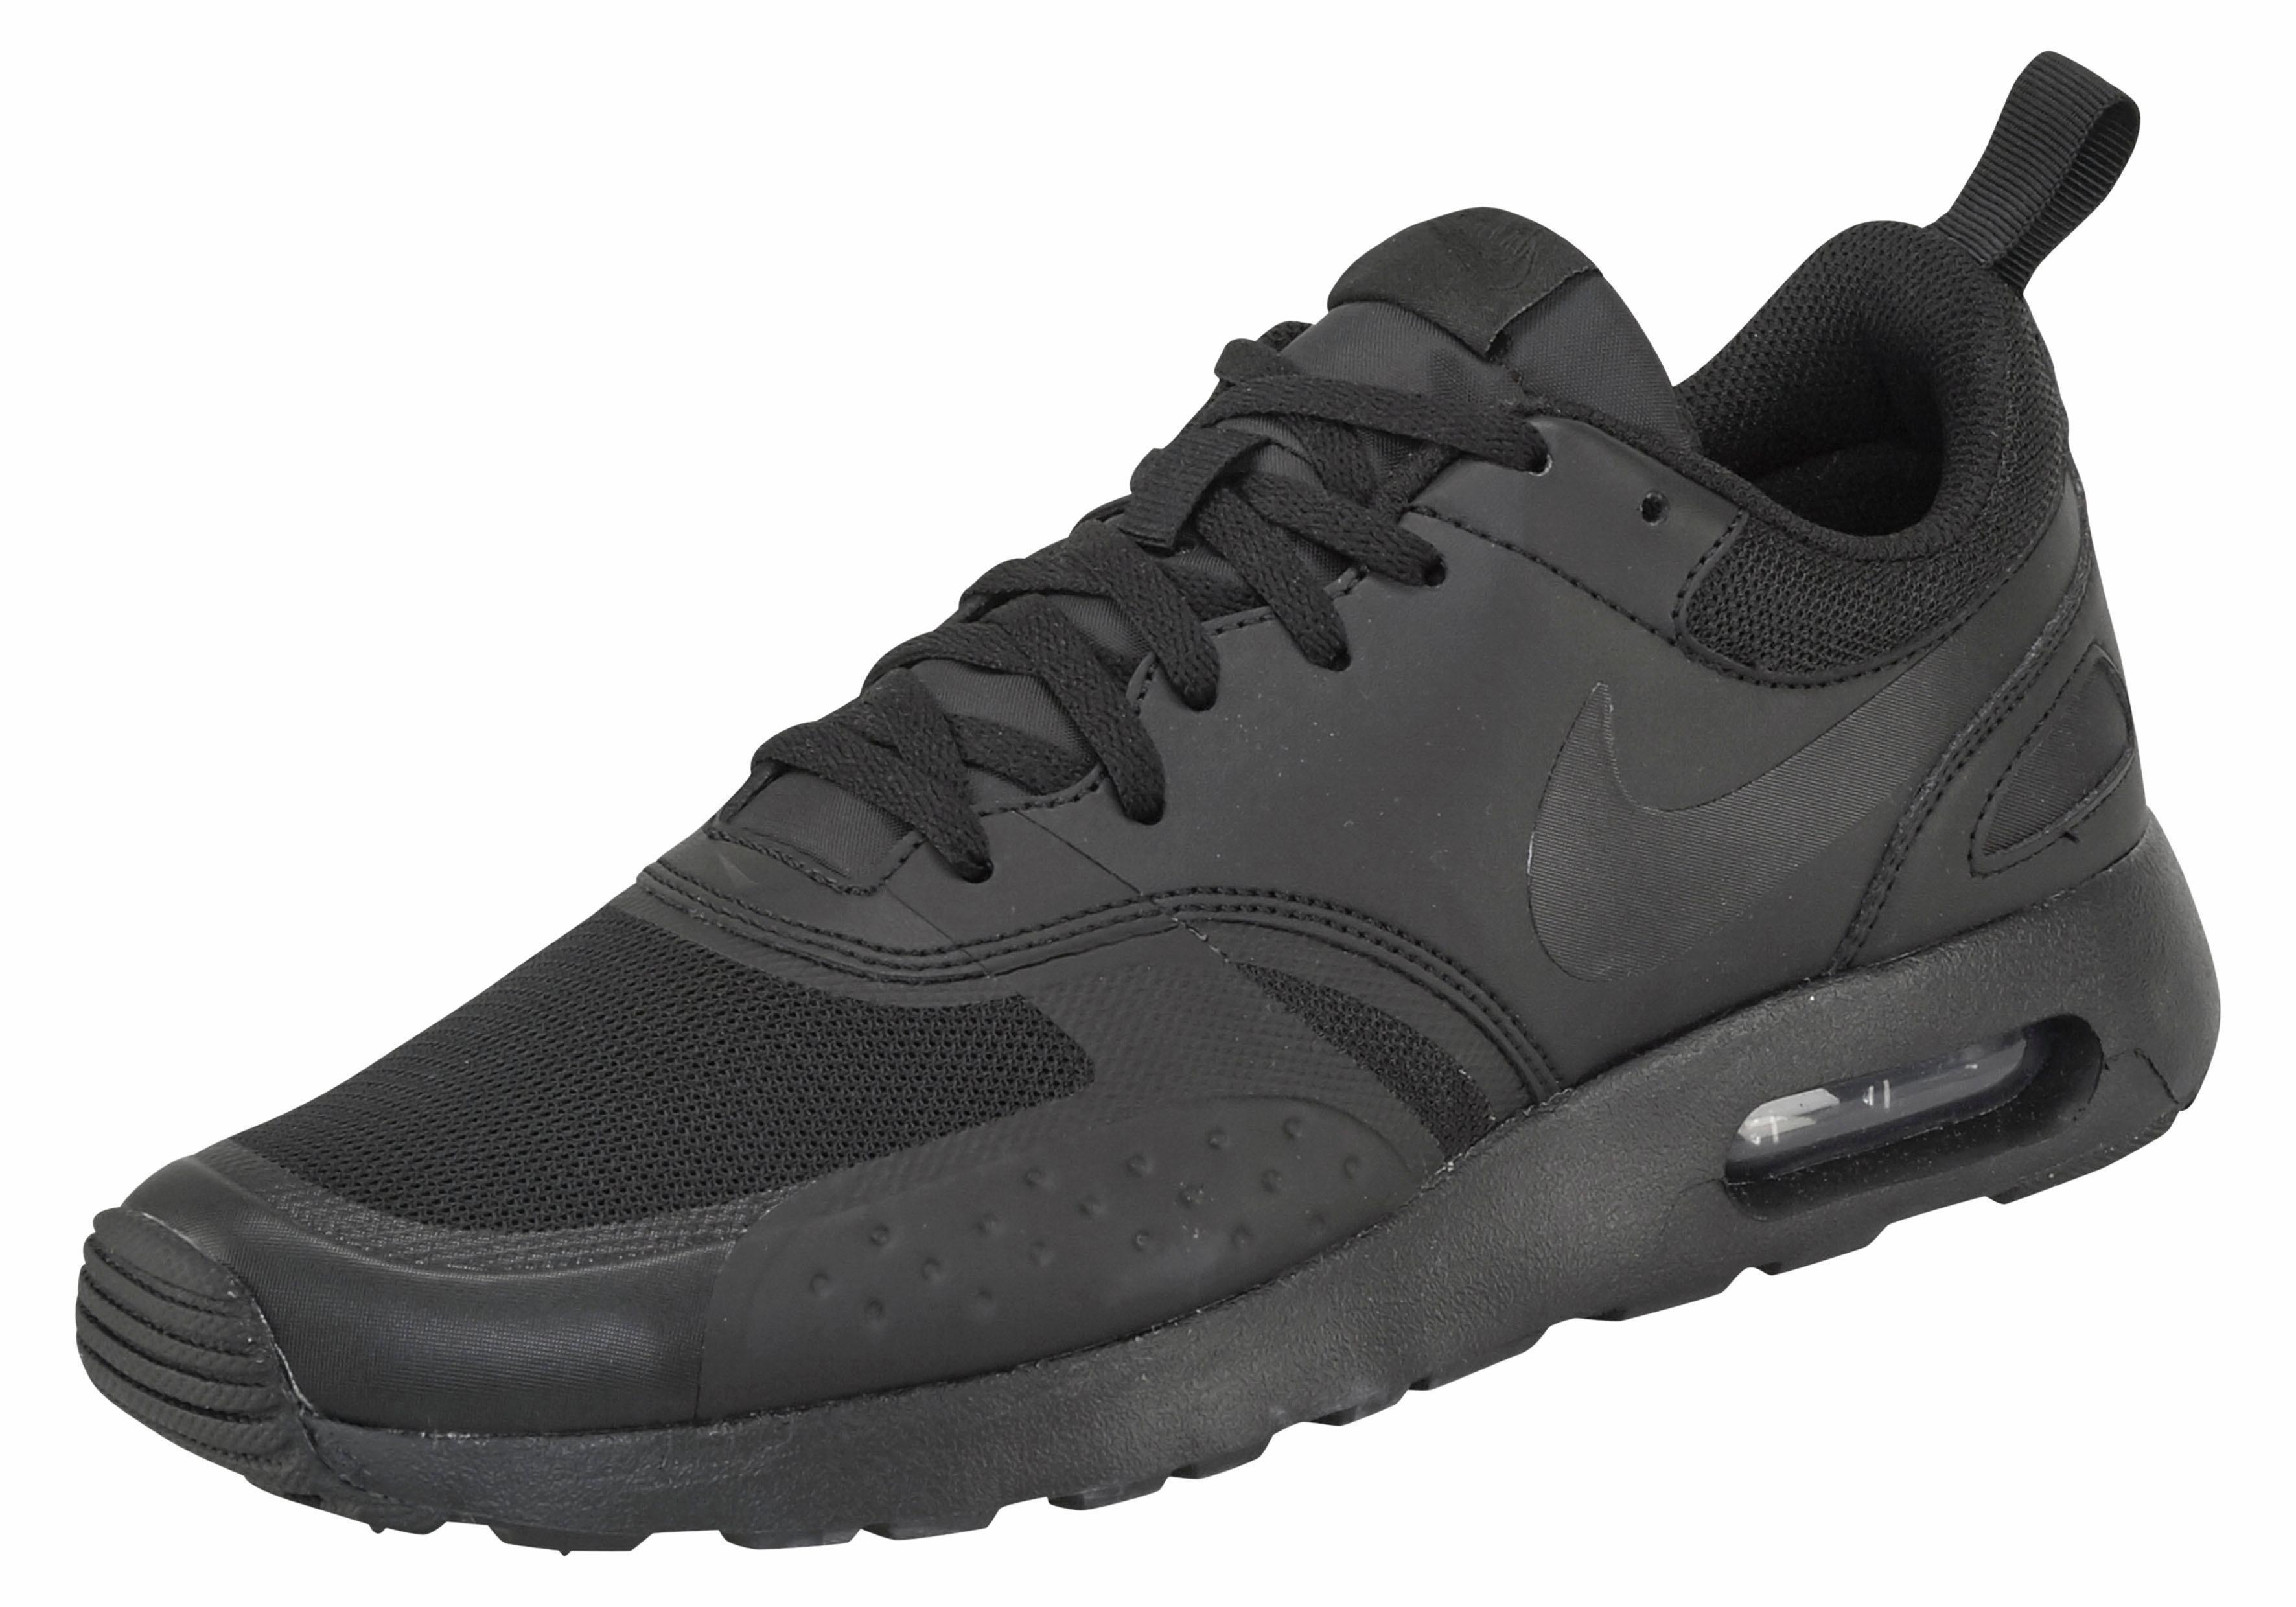 hot sale online b6e65 b3541 Afbeeldingsbron NIKE sneakers »Air Max Vision«